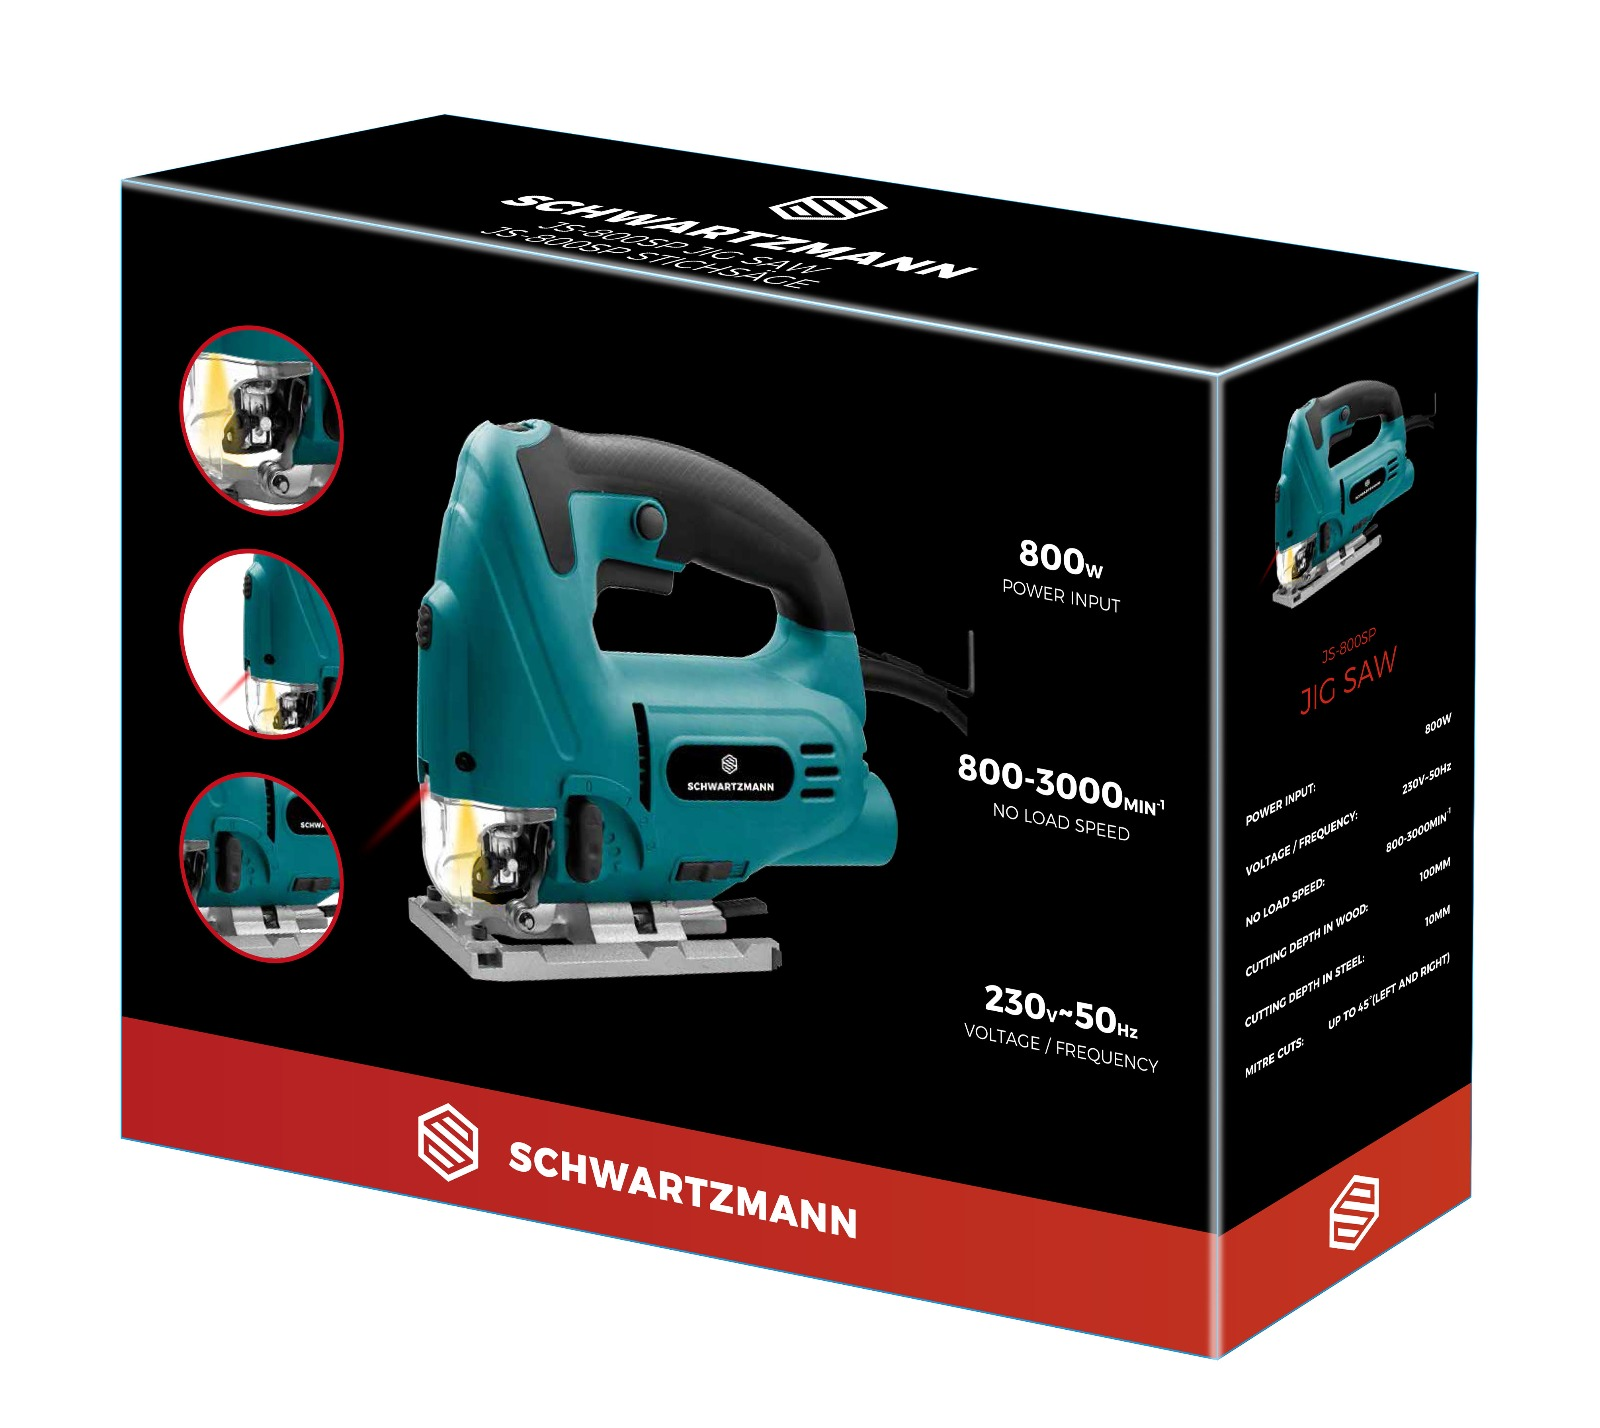 Lot 18069 - V Brand New 800w JS-800SP Jigsaw - Speed Regulator - Inspection Guard - Dust Extractor - Laser Light